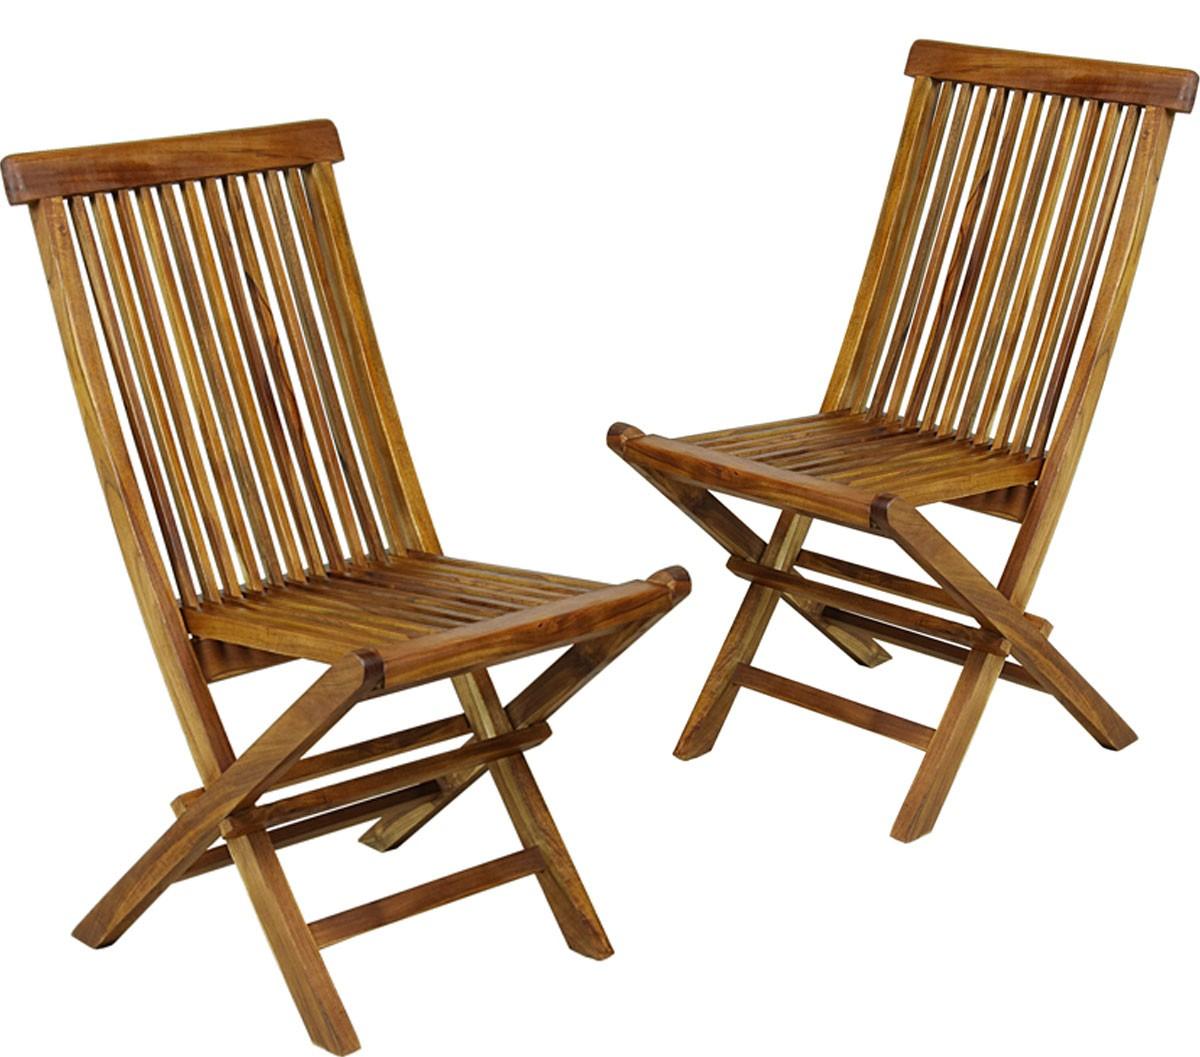 Mobilier de jardin chaises de jardin pliante en teck huilé ...